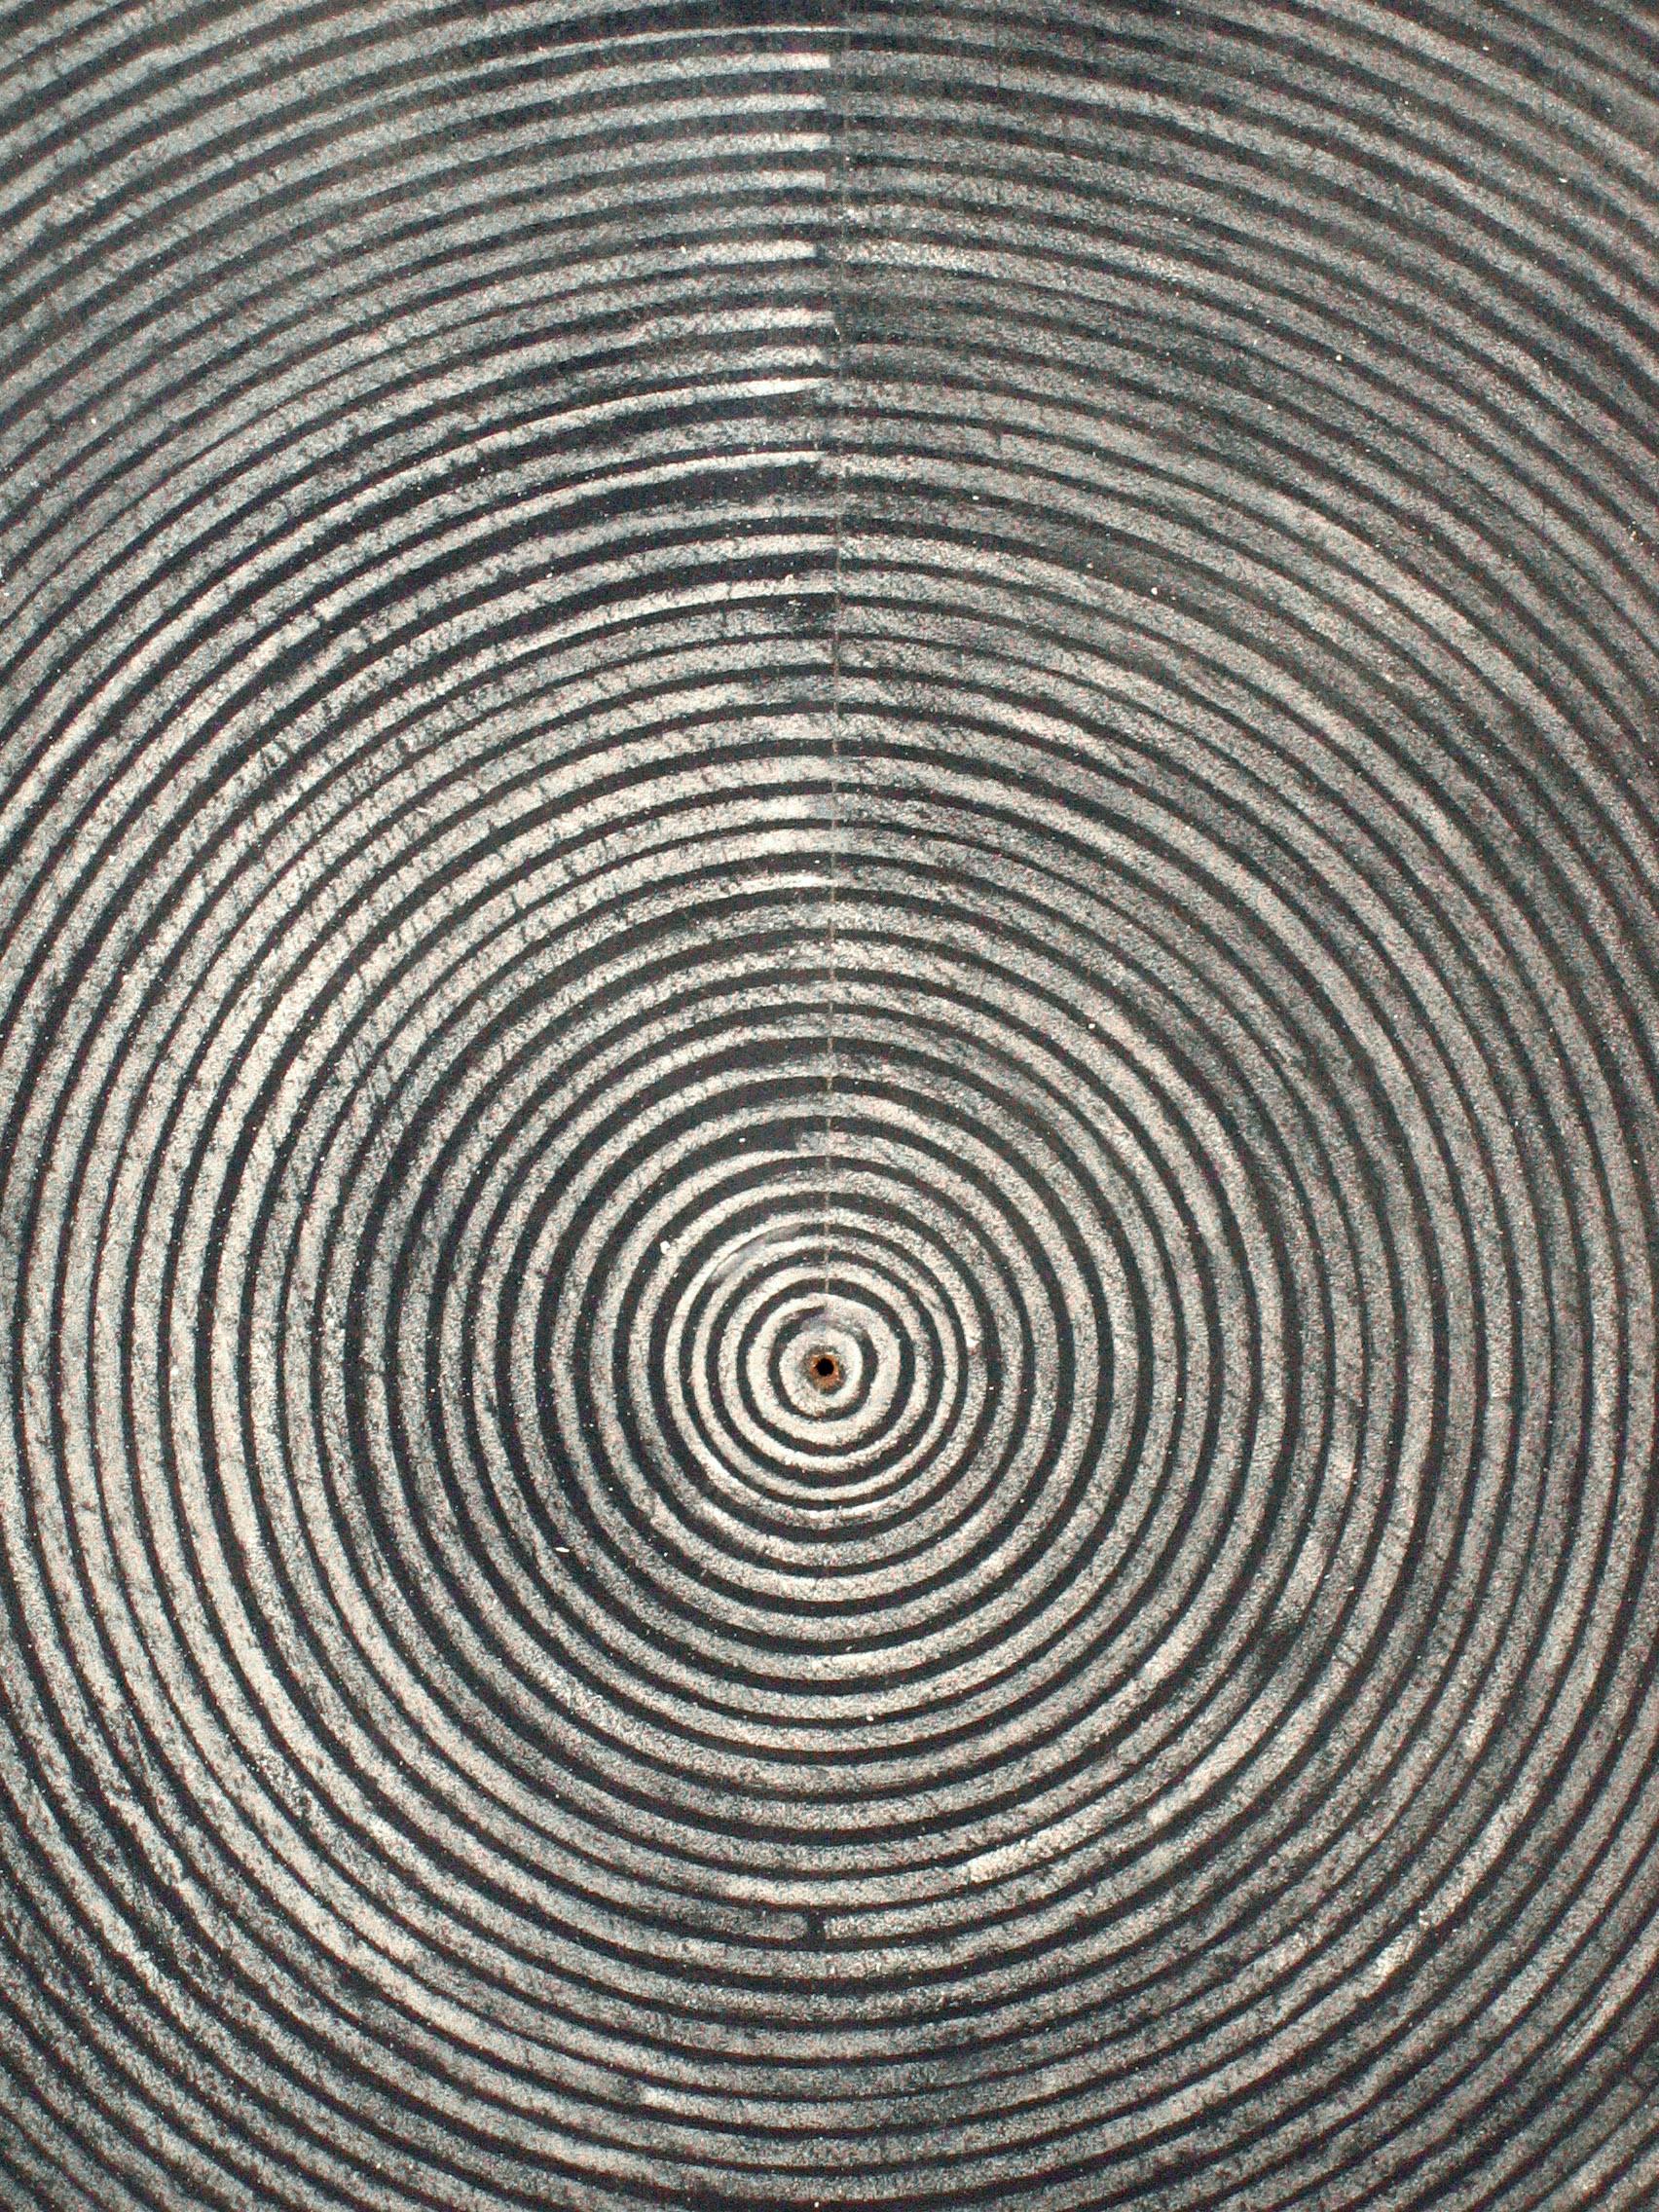 "Still  (detail) 2005 chalk and acrylic on board 48 x 48"" / 122 x 122 cm"